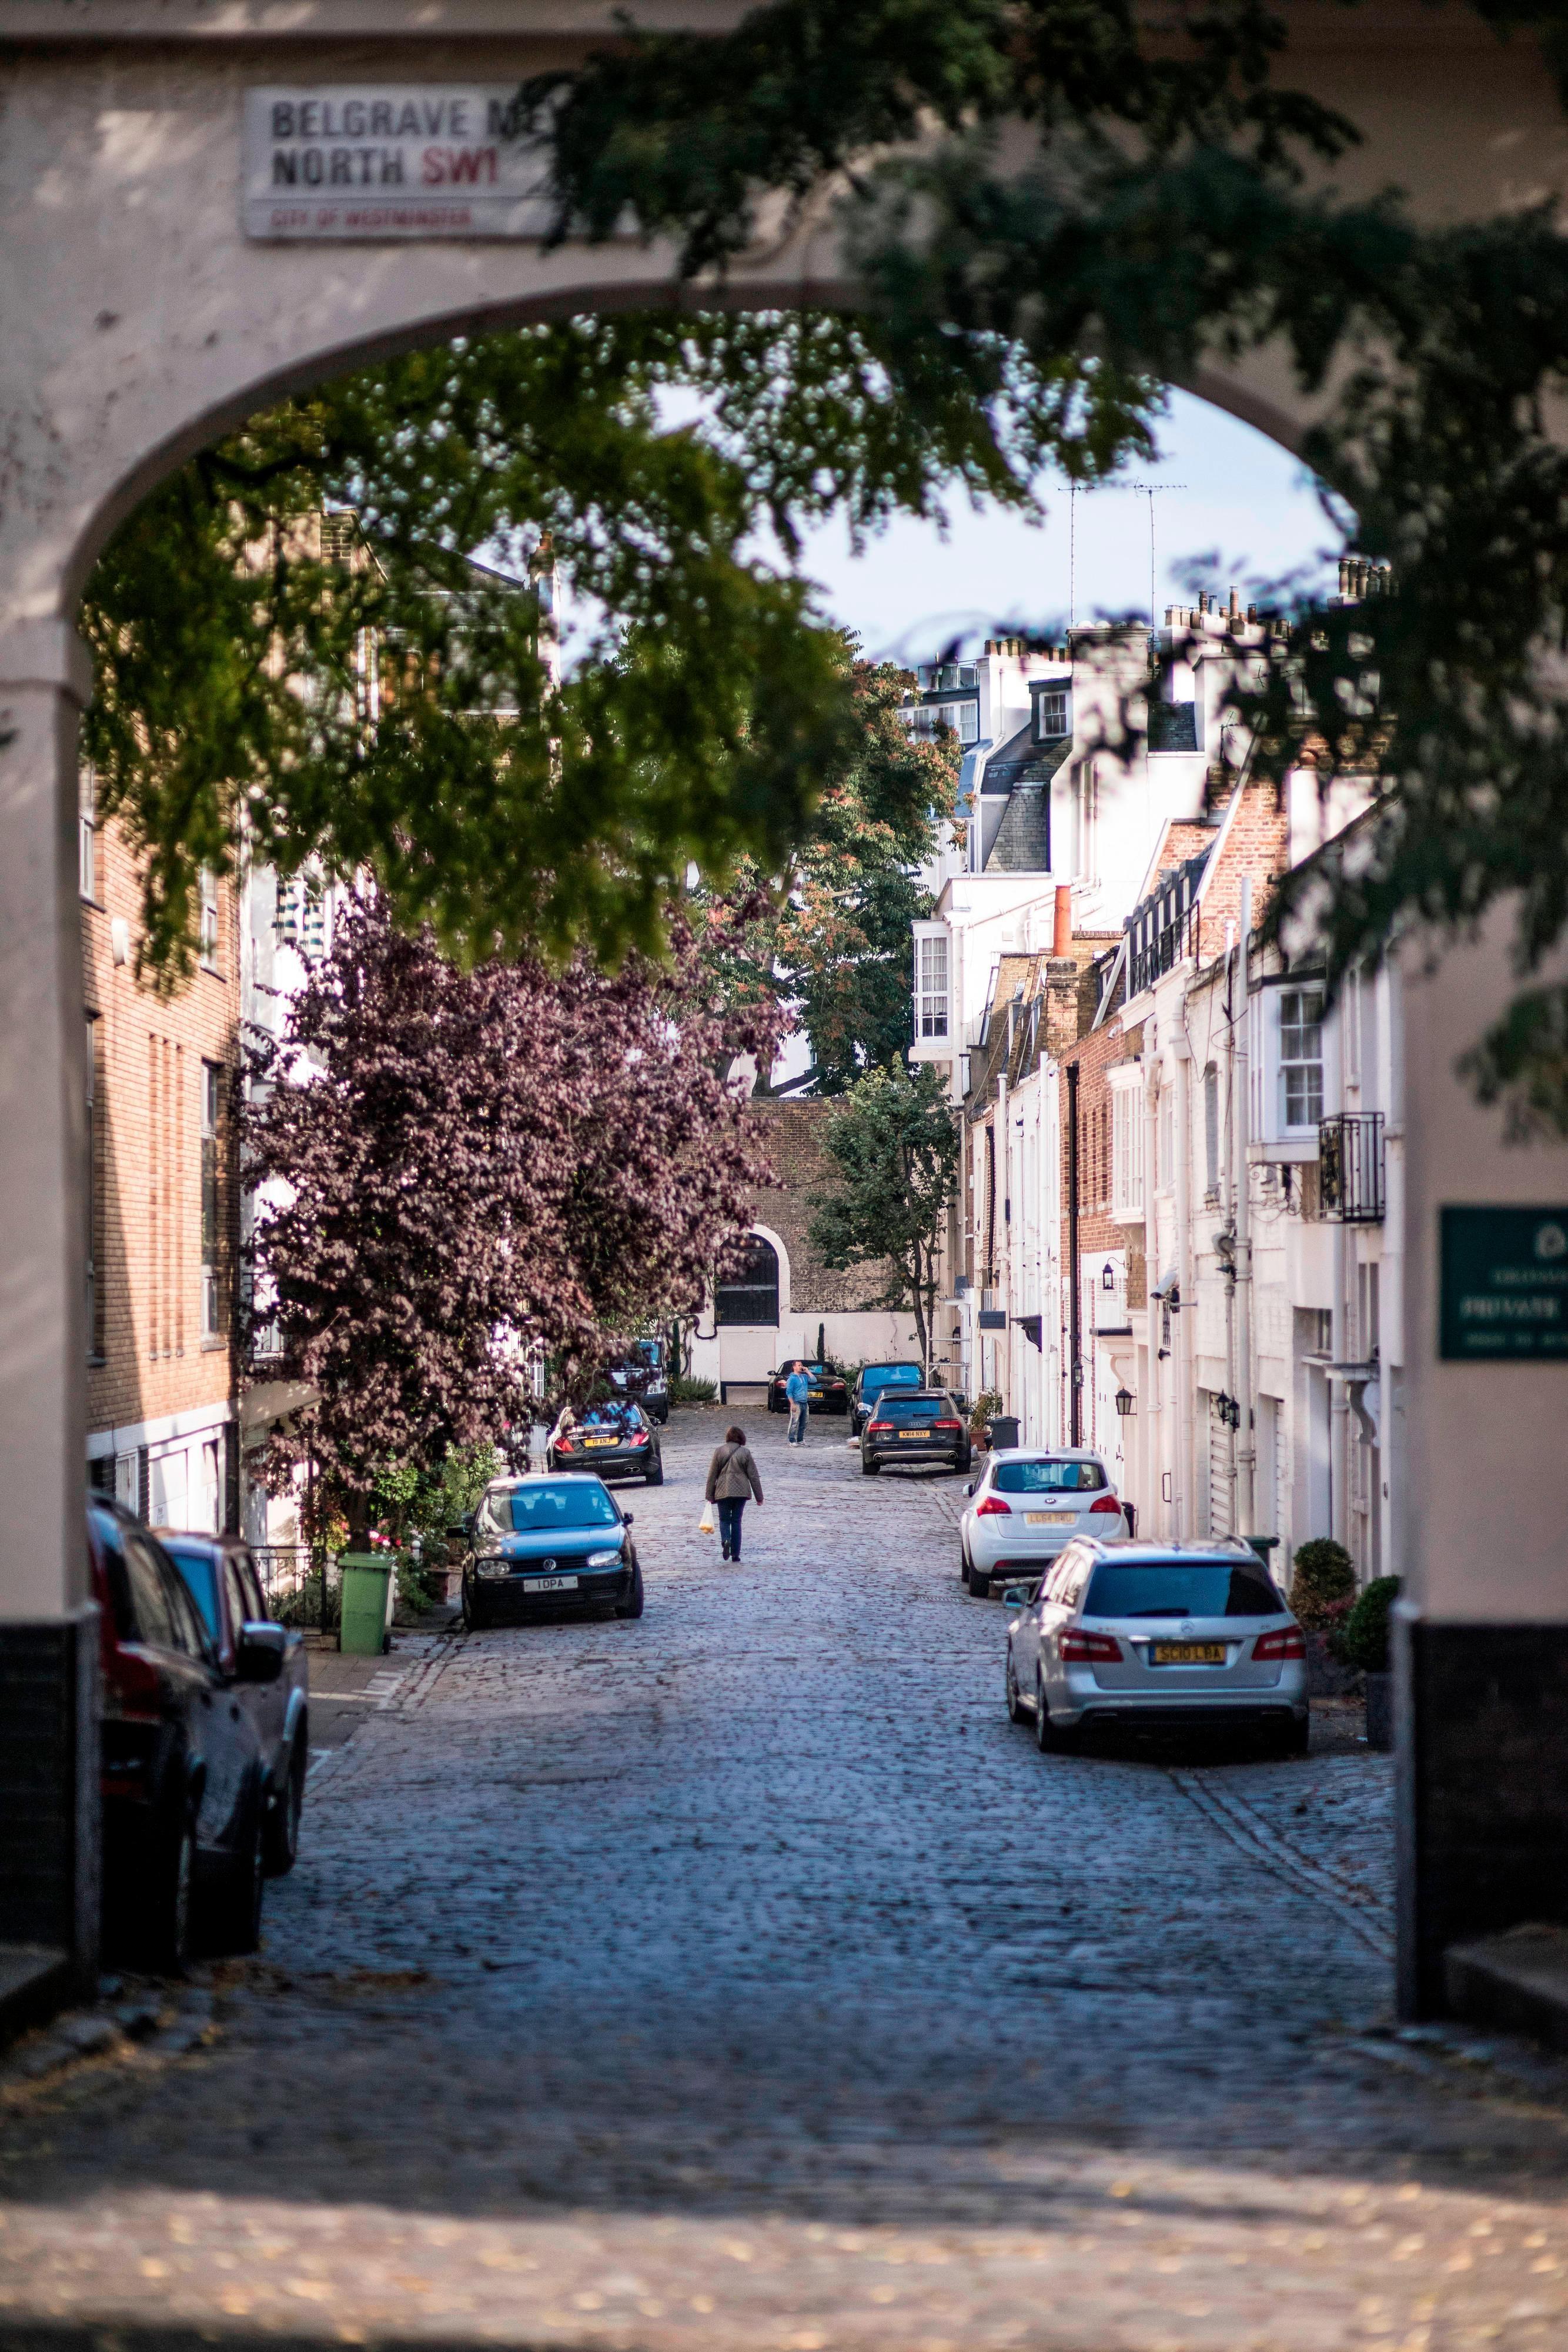 Belgravia Street